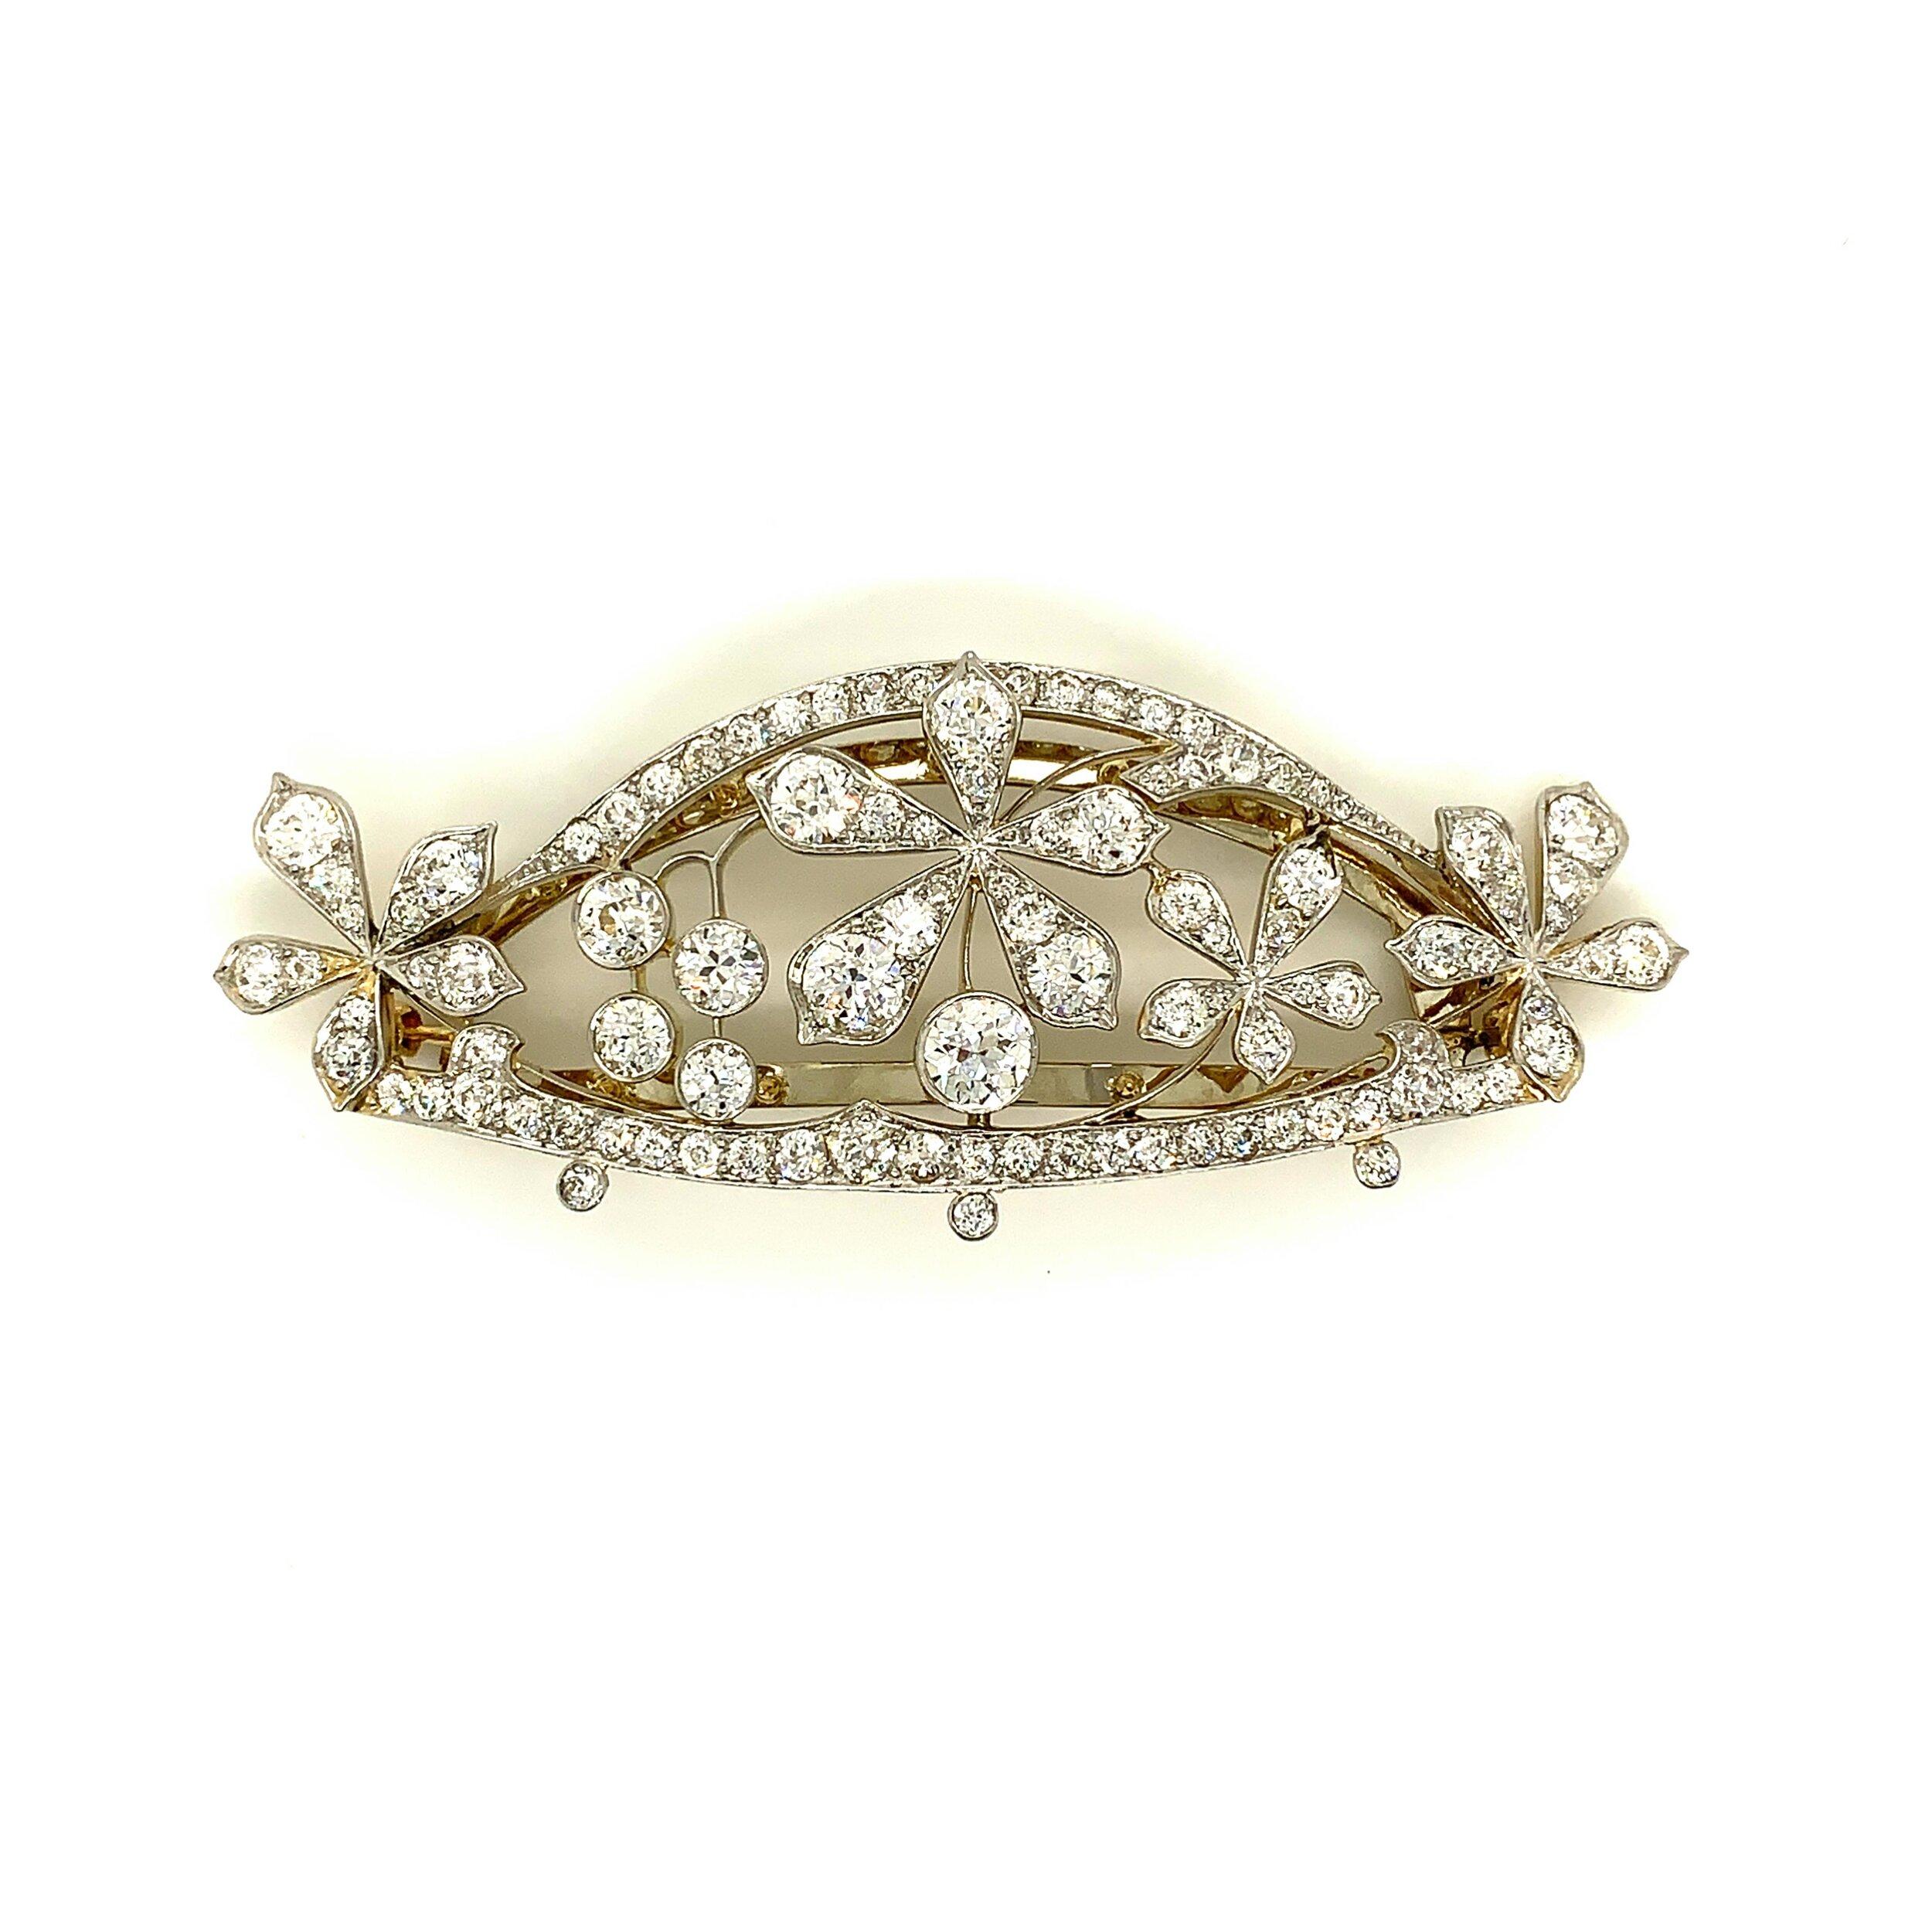 Signed Kirkpatrick c. 1895 Platinum Topped Gold Diamond Hair Barrette  Est. US$ 5,000-6,500